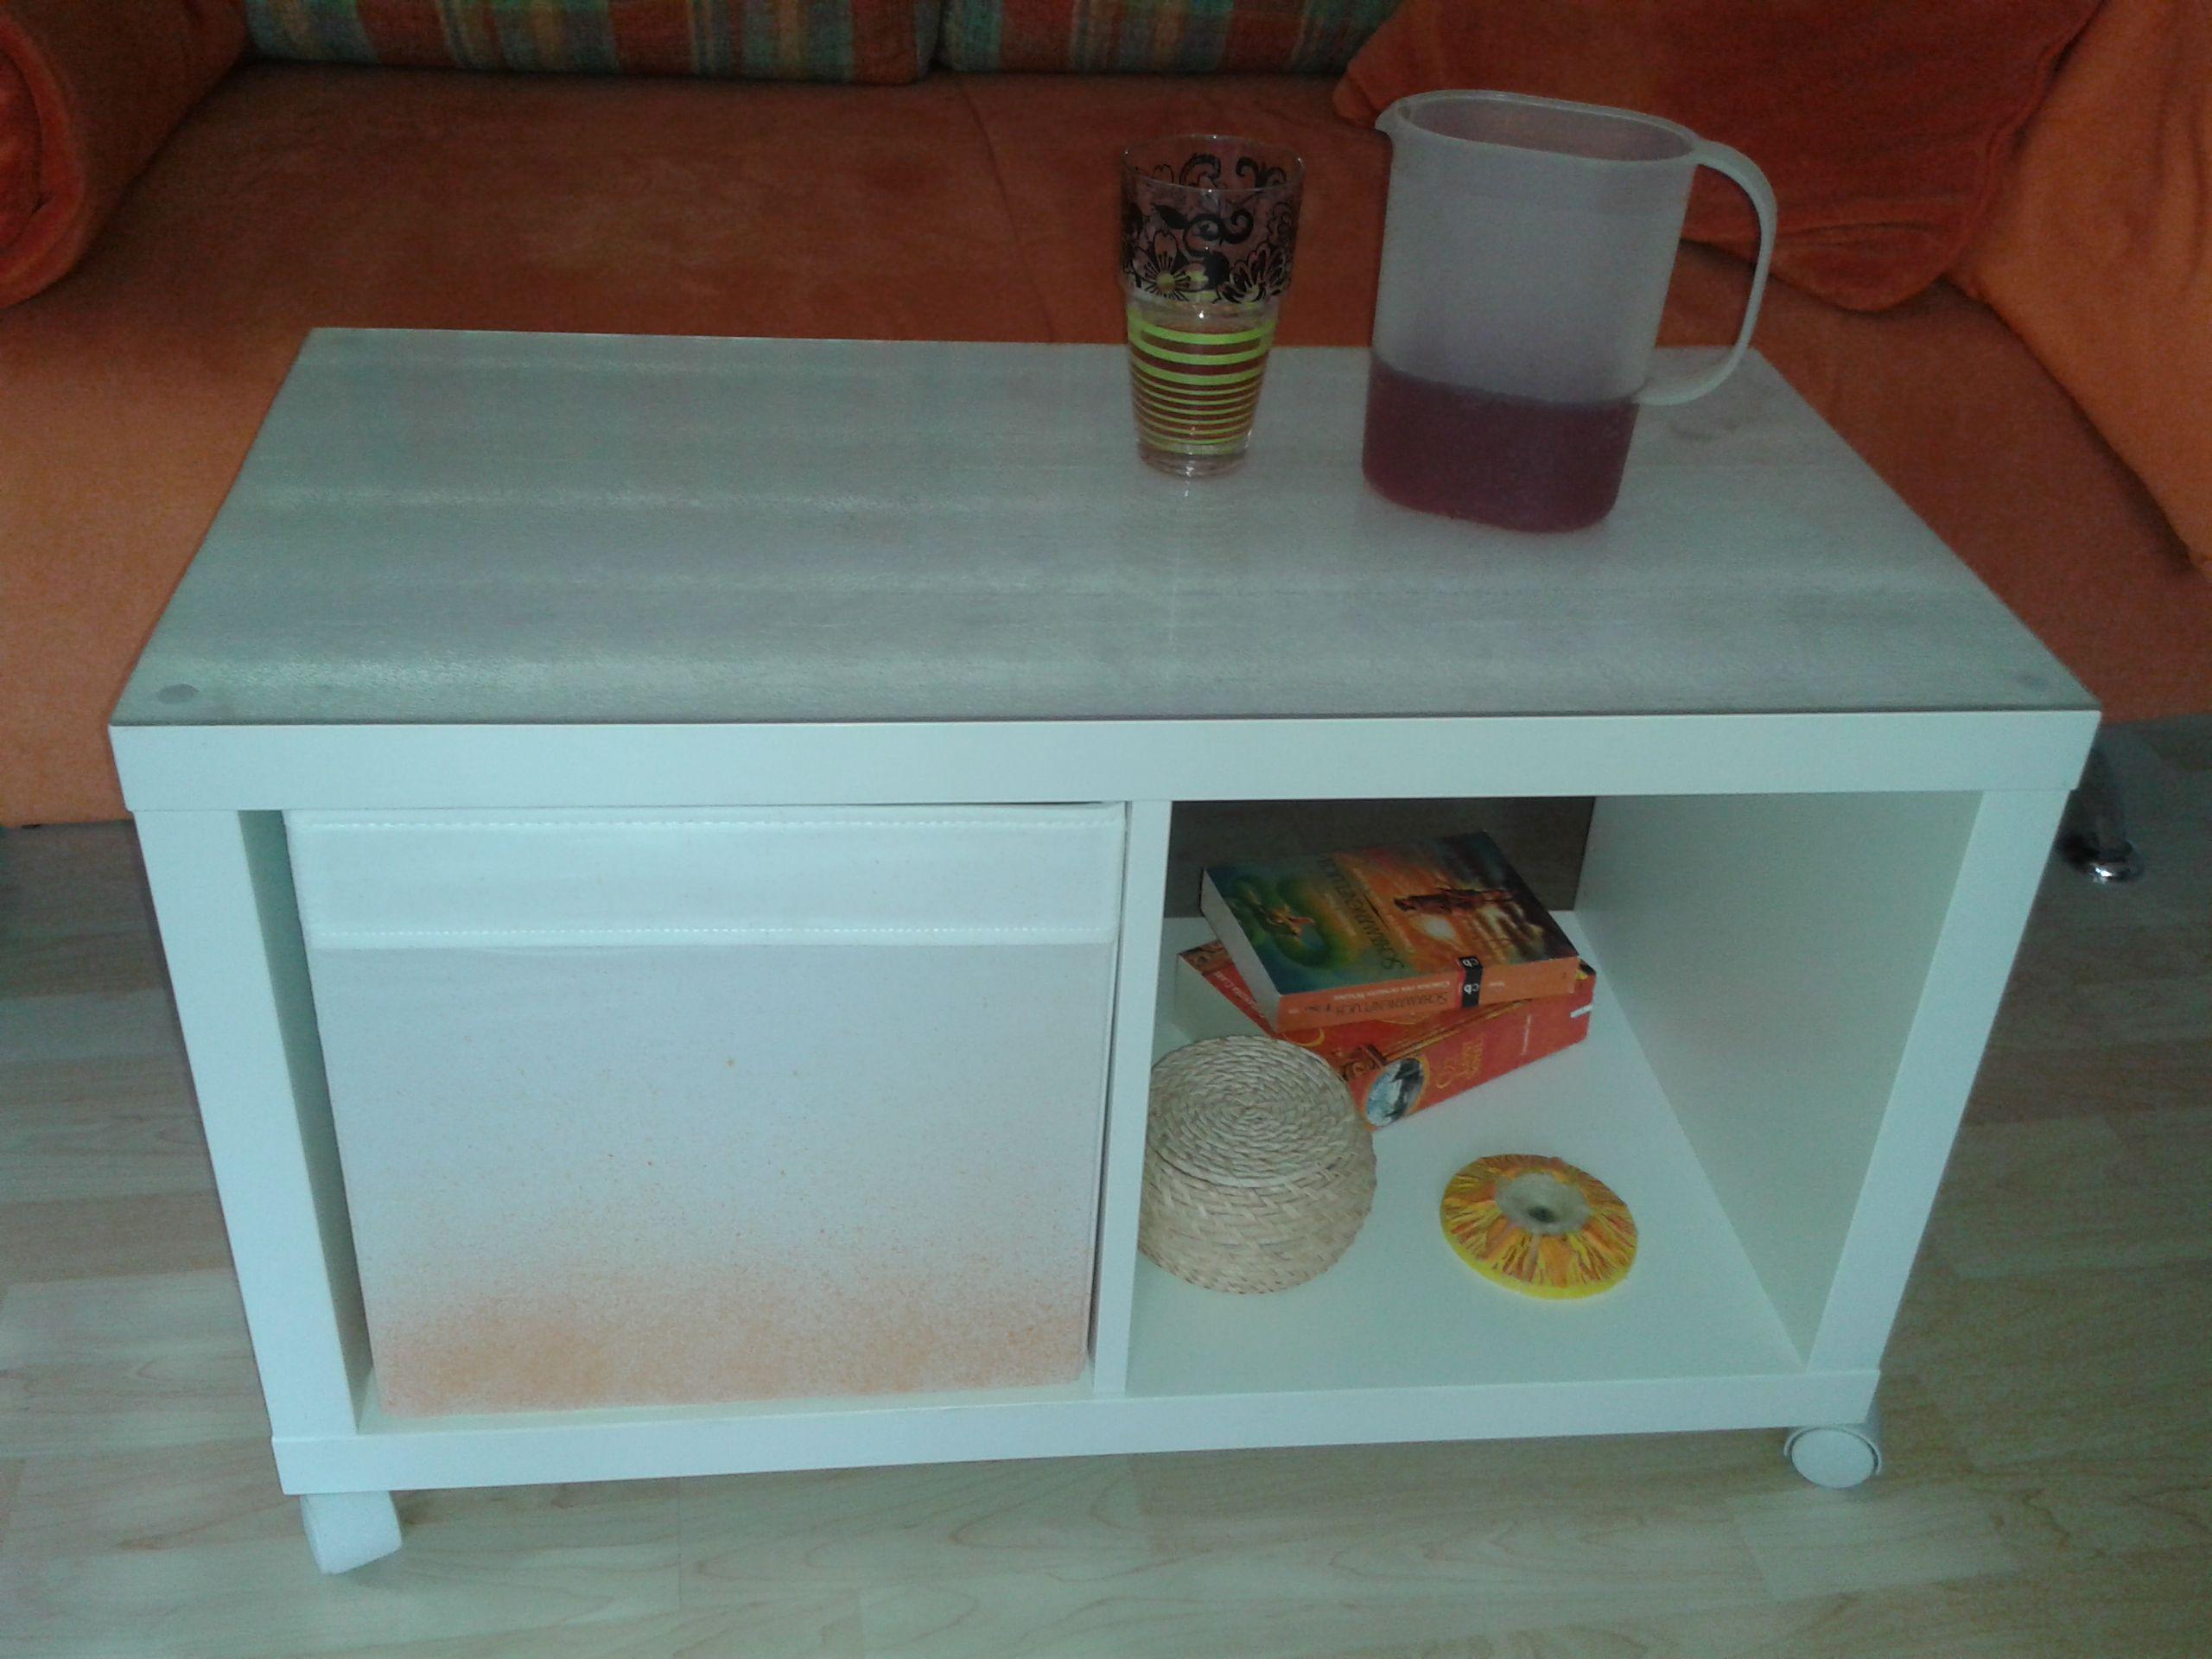 My First Ikea Hack I Turned A Kallax Shelf Into A Coffee Table By Adding Perspex And Some Wheels Cube Furniture Ikea Kallax Shelf [ 1920 x 2560 Pixel ]